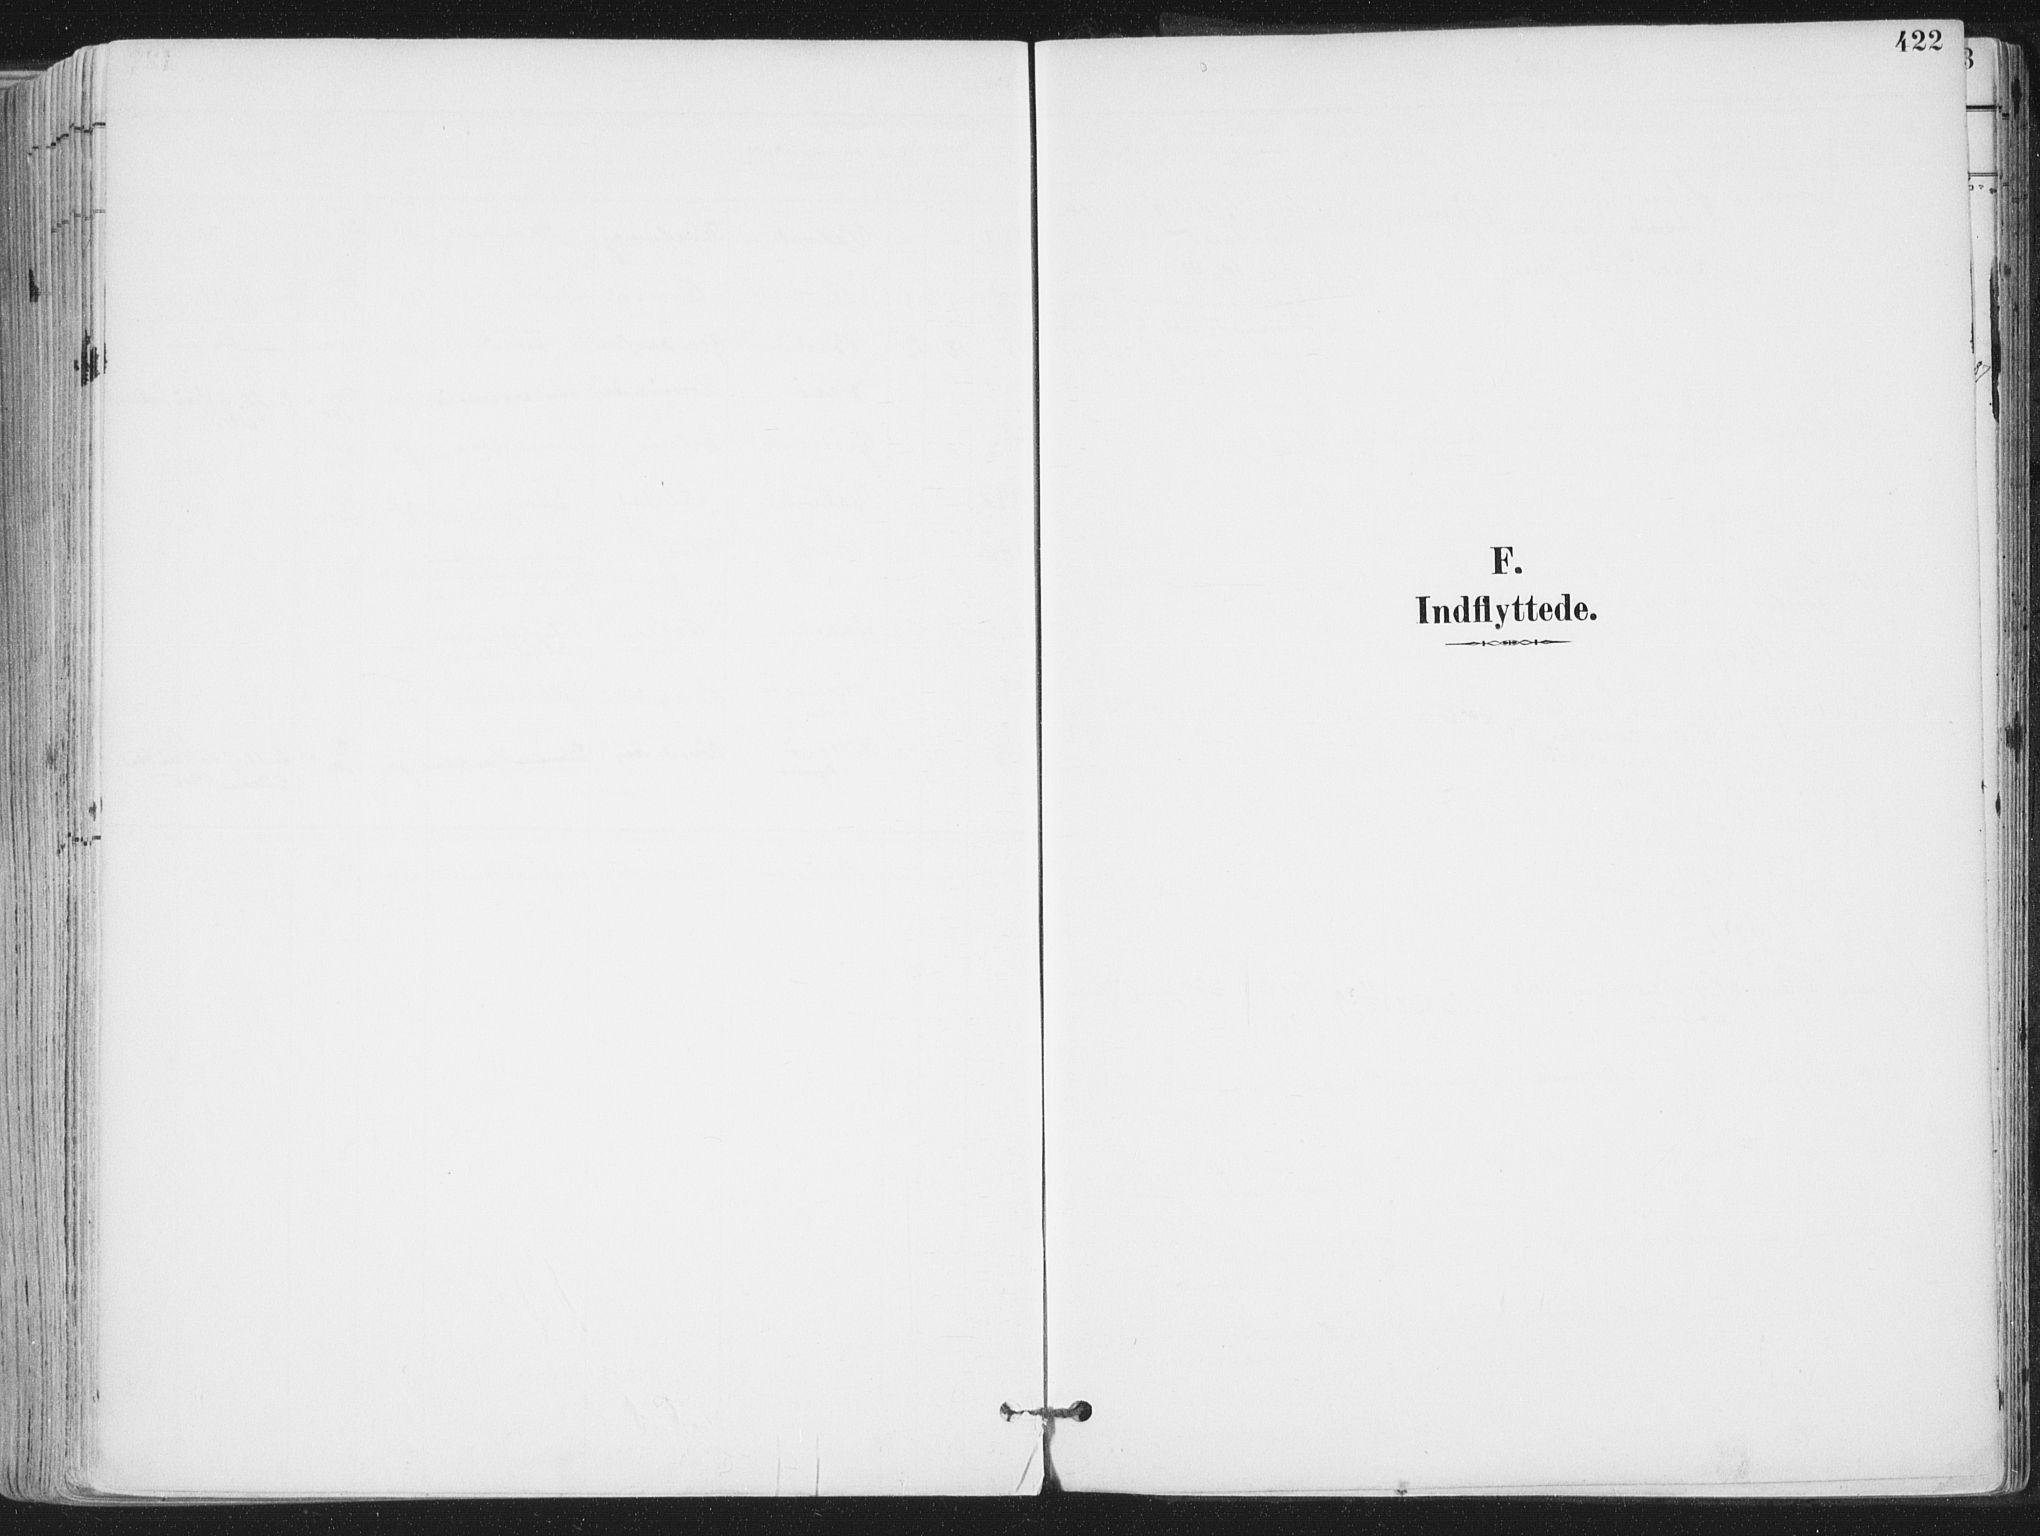 SAT, Ministerialprotokoller, klokkerbøker og fødselsregistre - Nordland, 802/L0055: Ministerialbok nr. 802A02, 1894-1915, s. 422